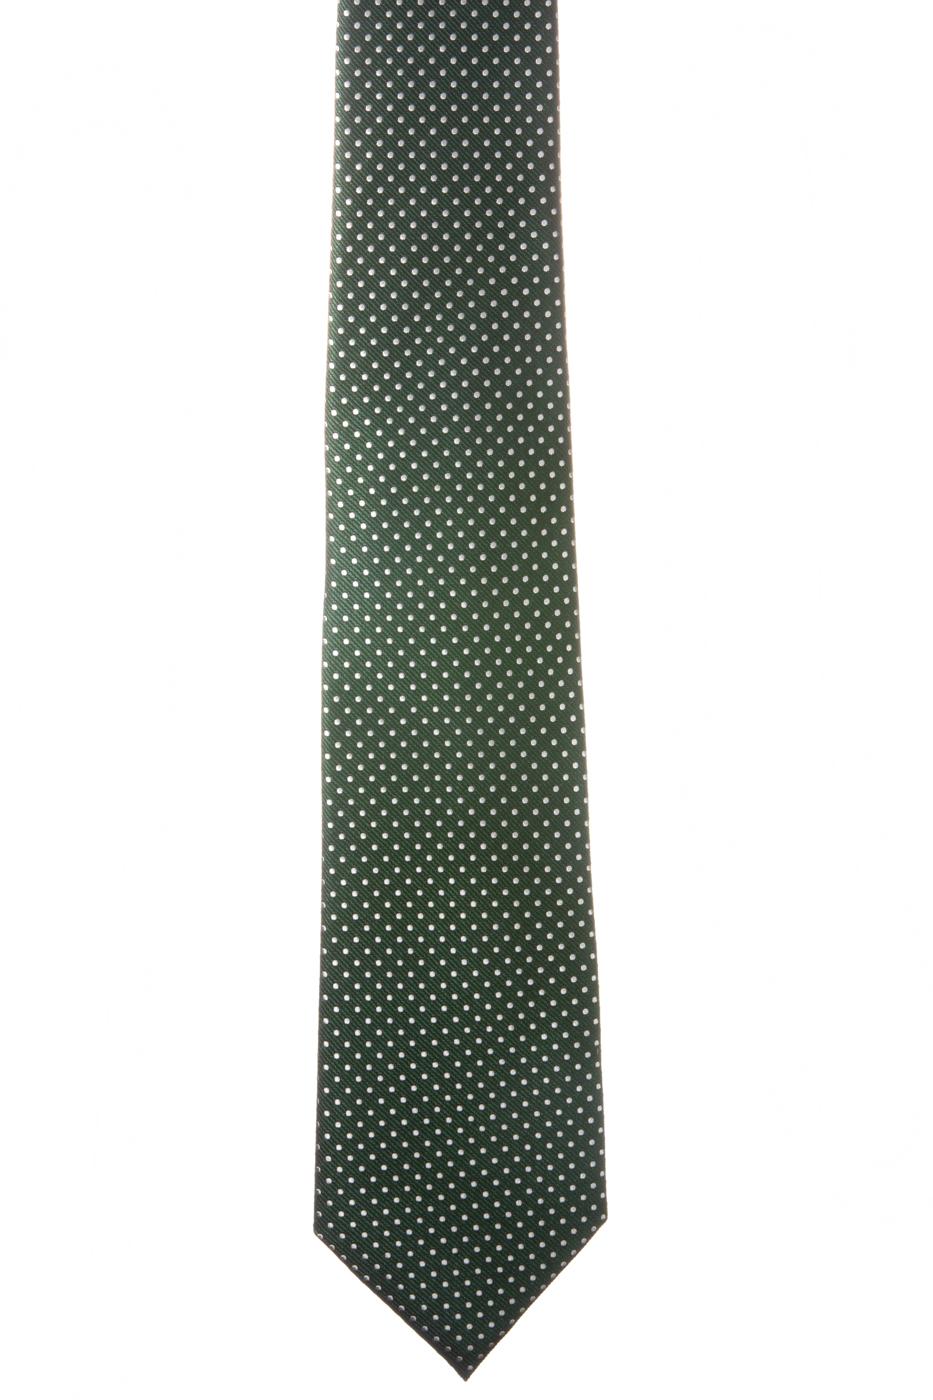 Corbata verde botella topos micro blancos